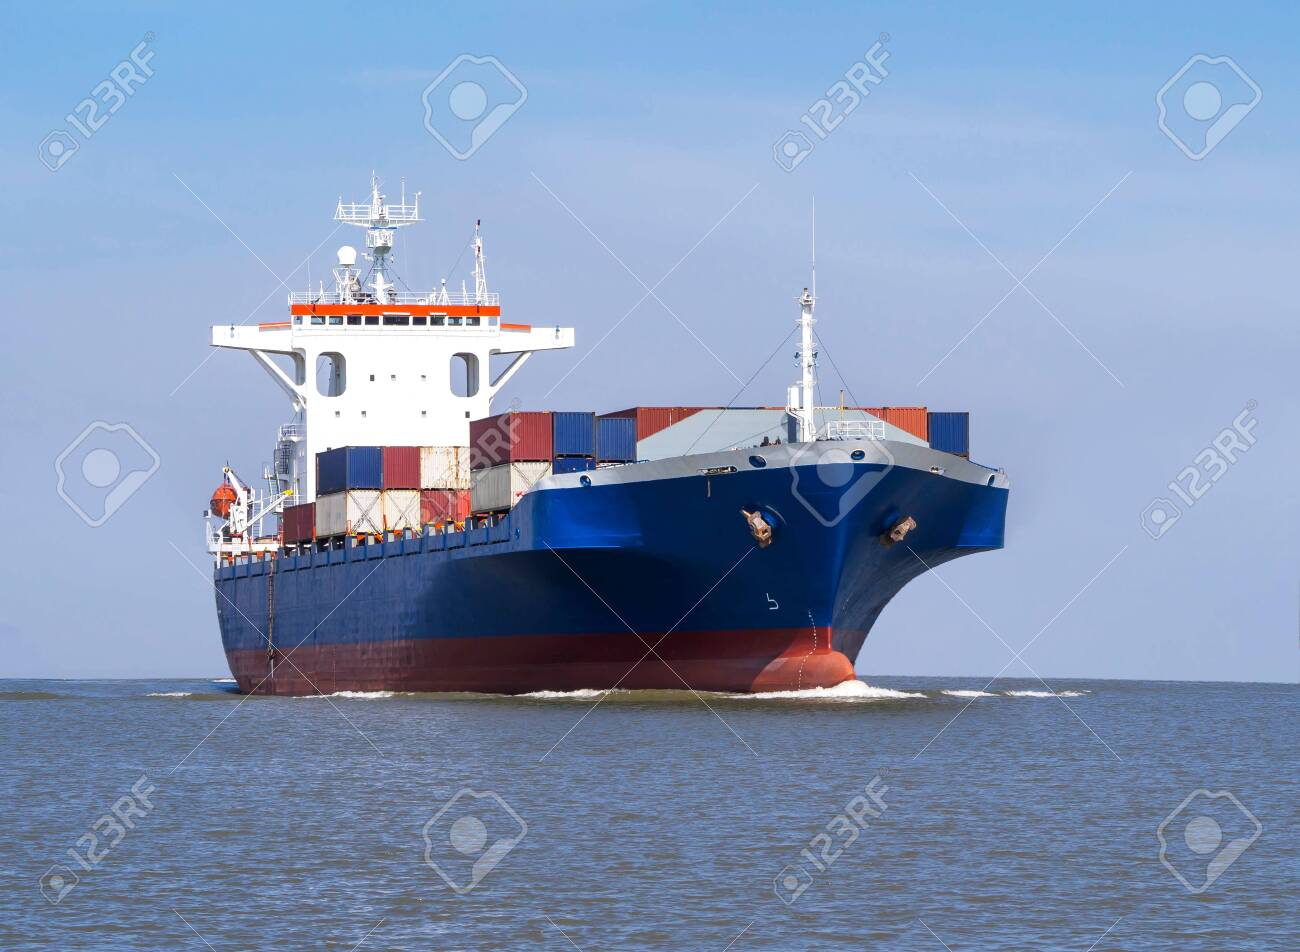 Logistics and Transportation of international Container Cargo ship - 131266286